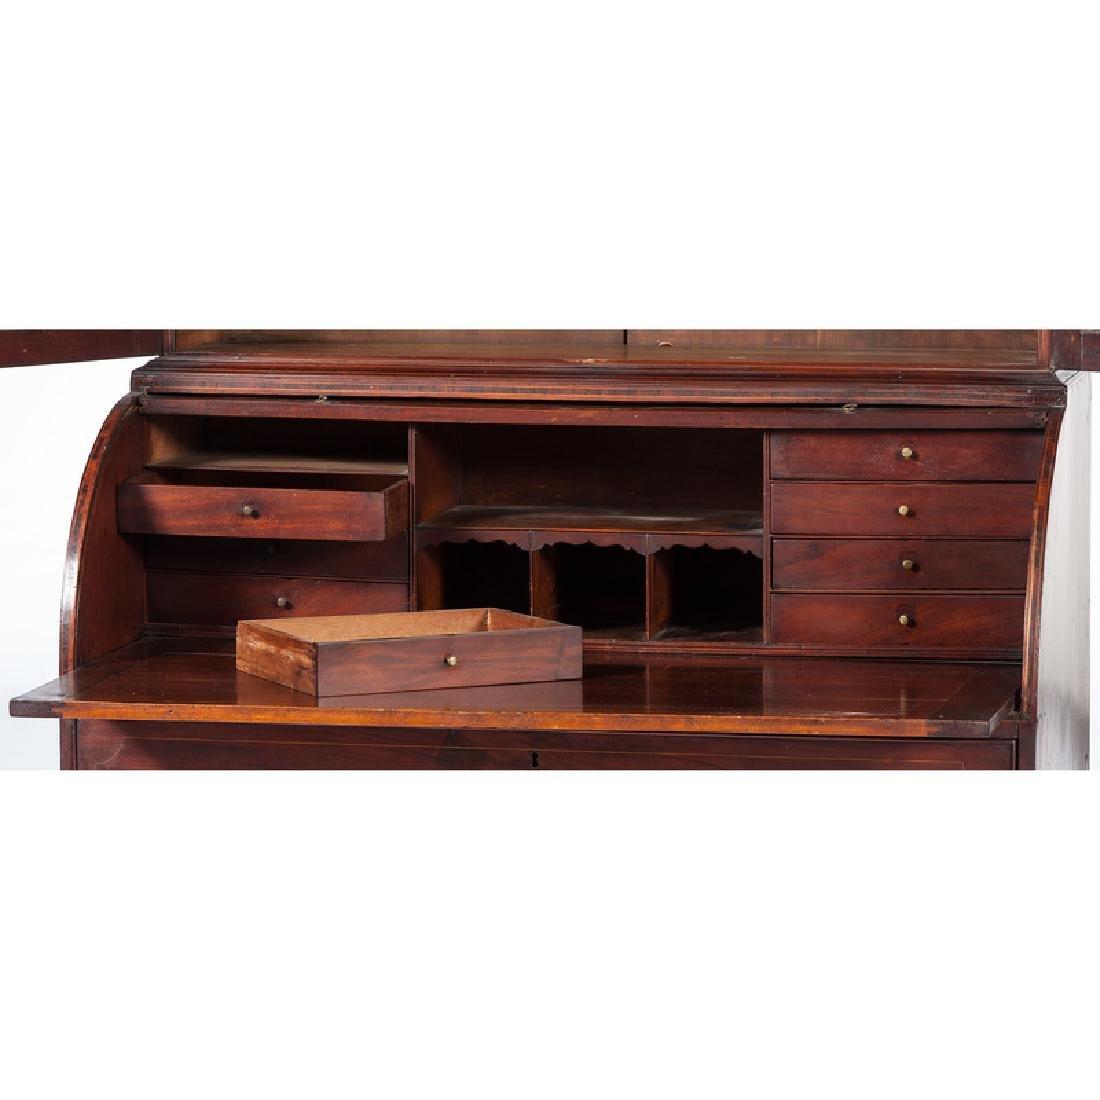 Federal Roll Top Secretary Bookcase - 3